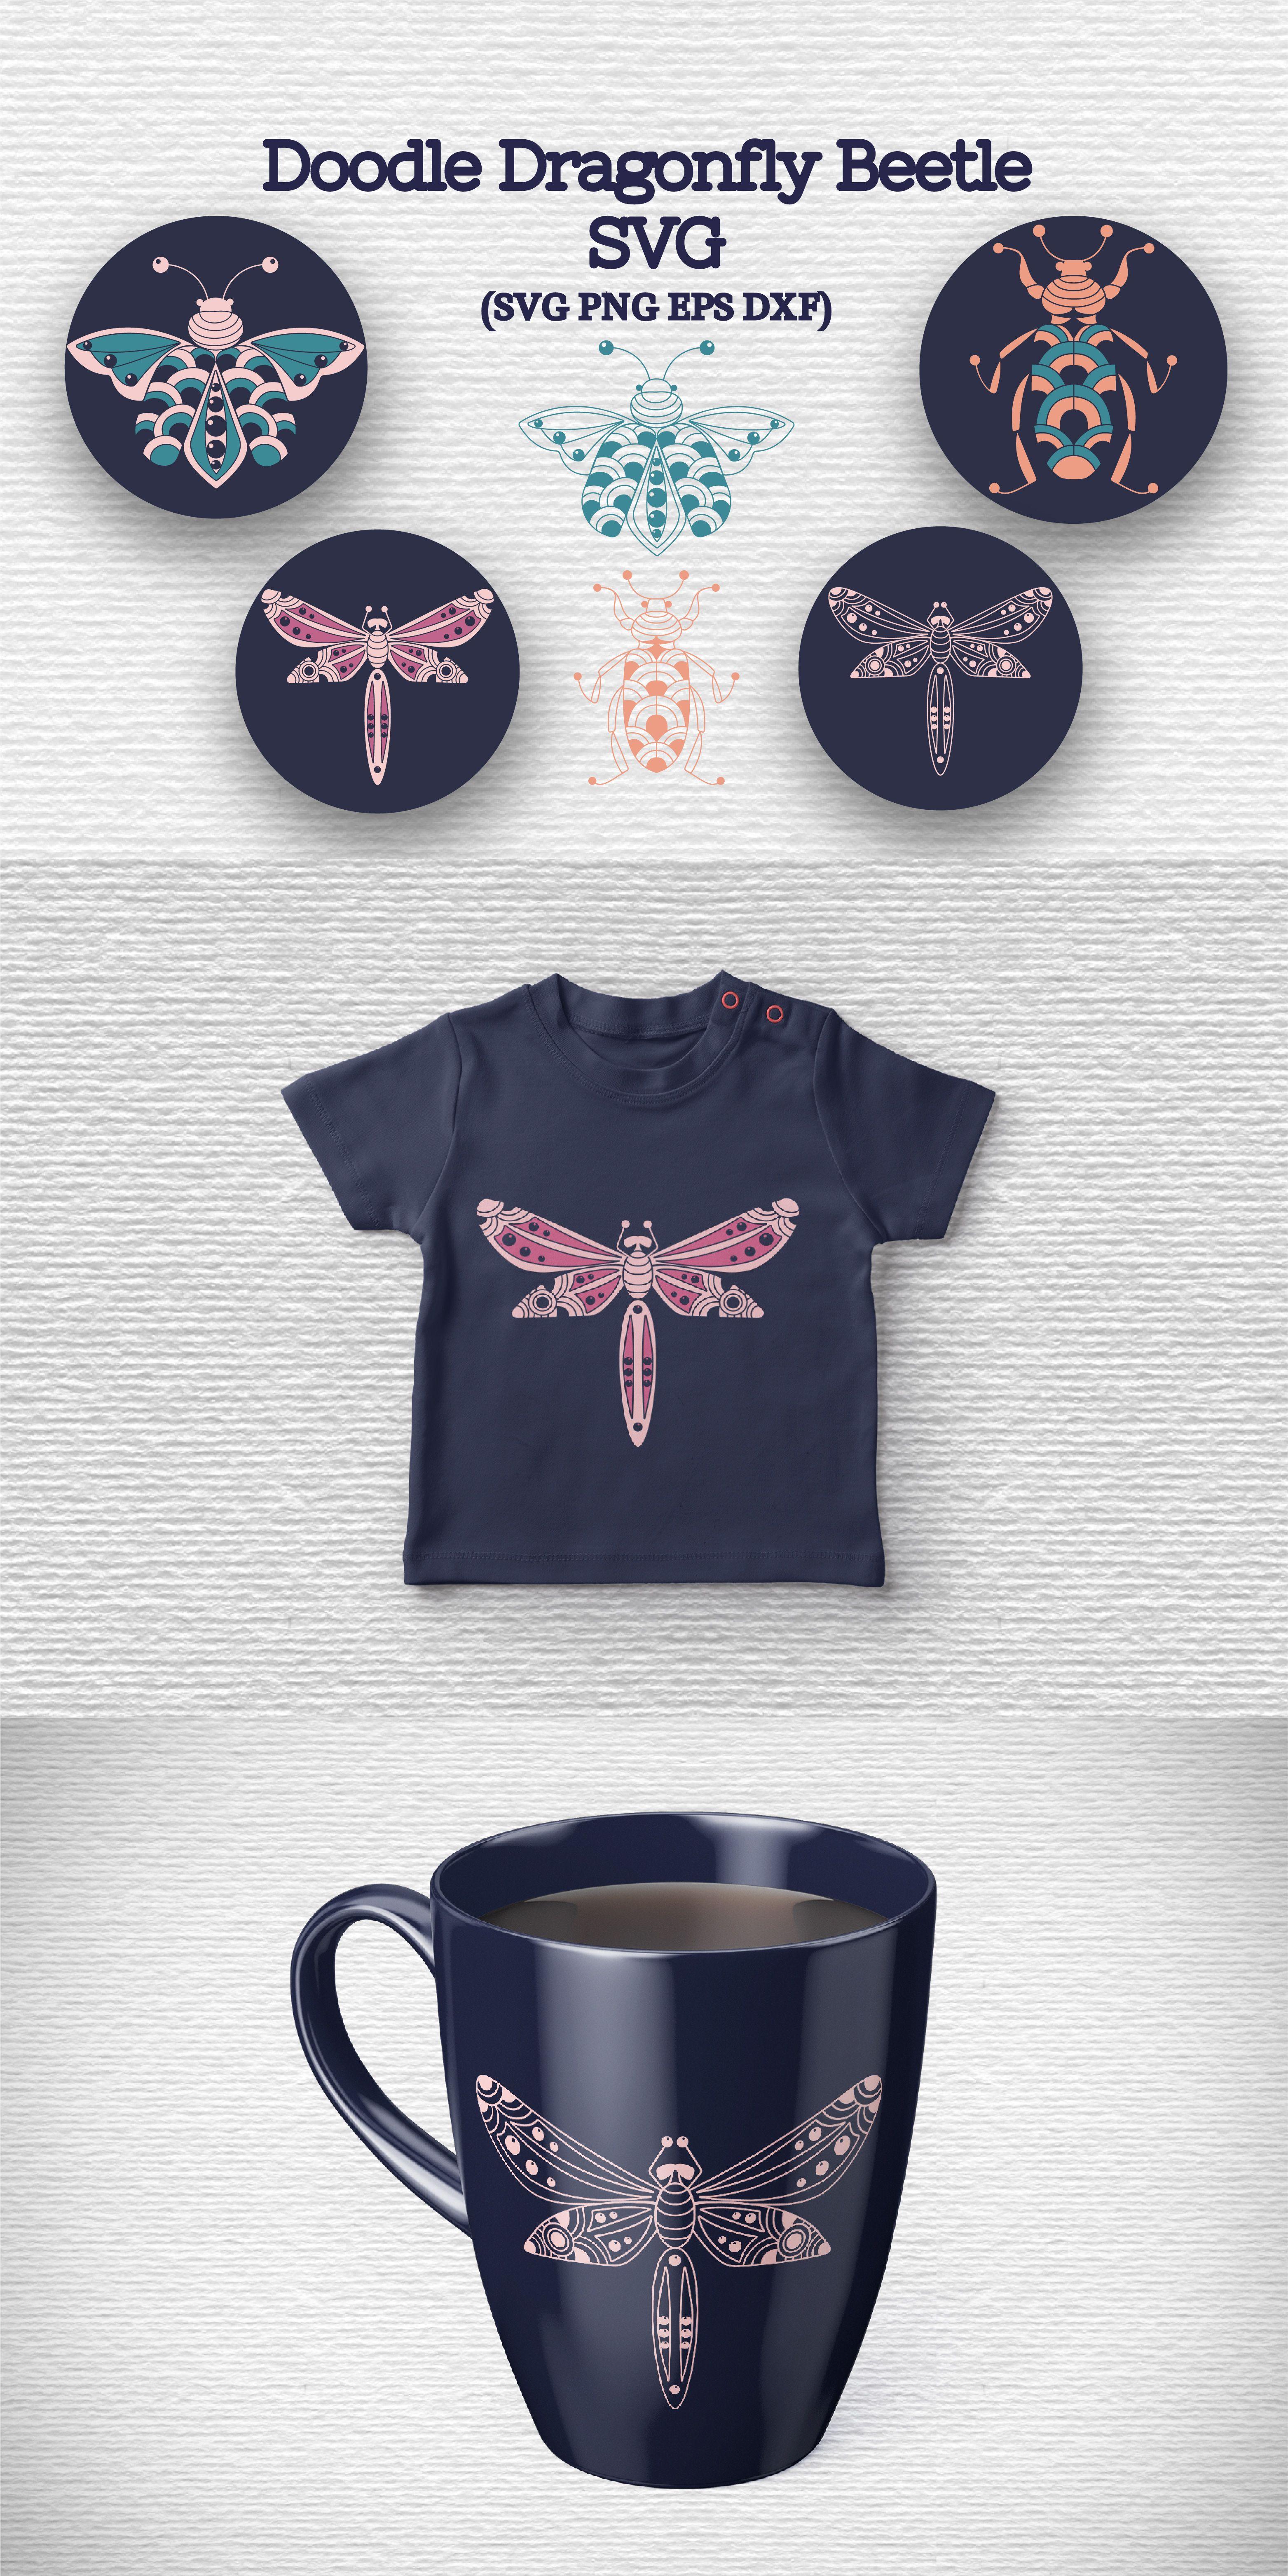 Download Doodle Dragonfly Beetle